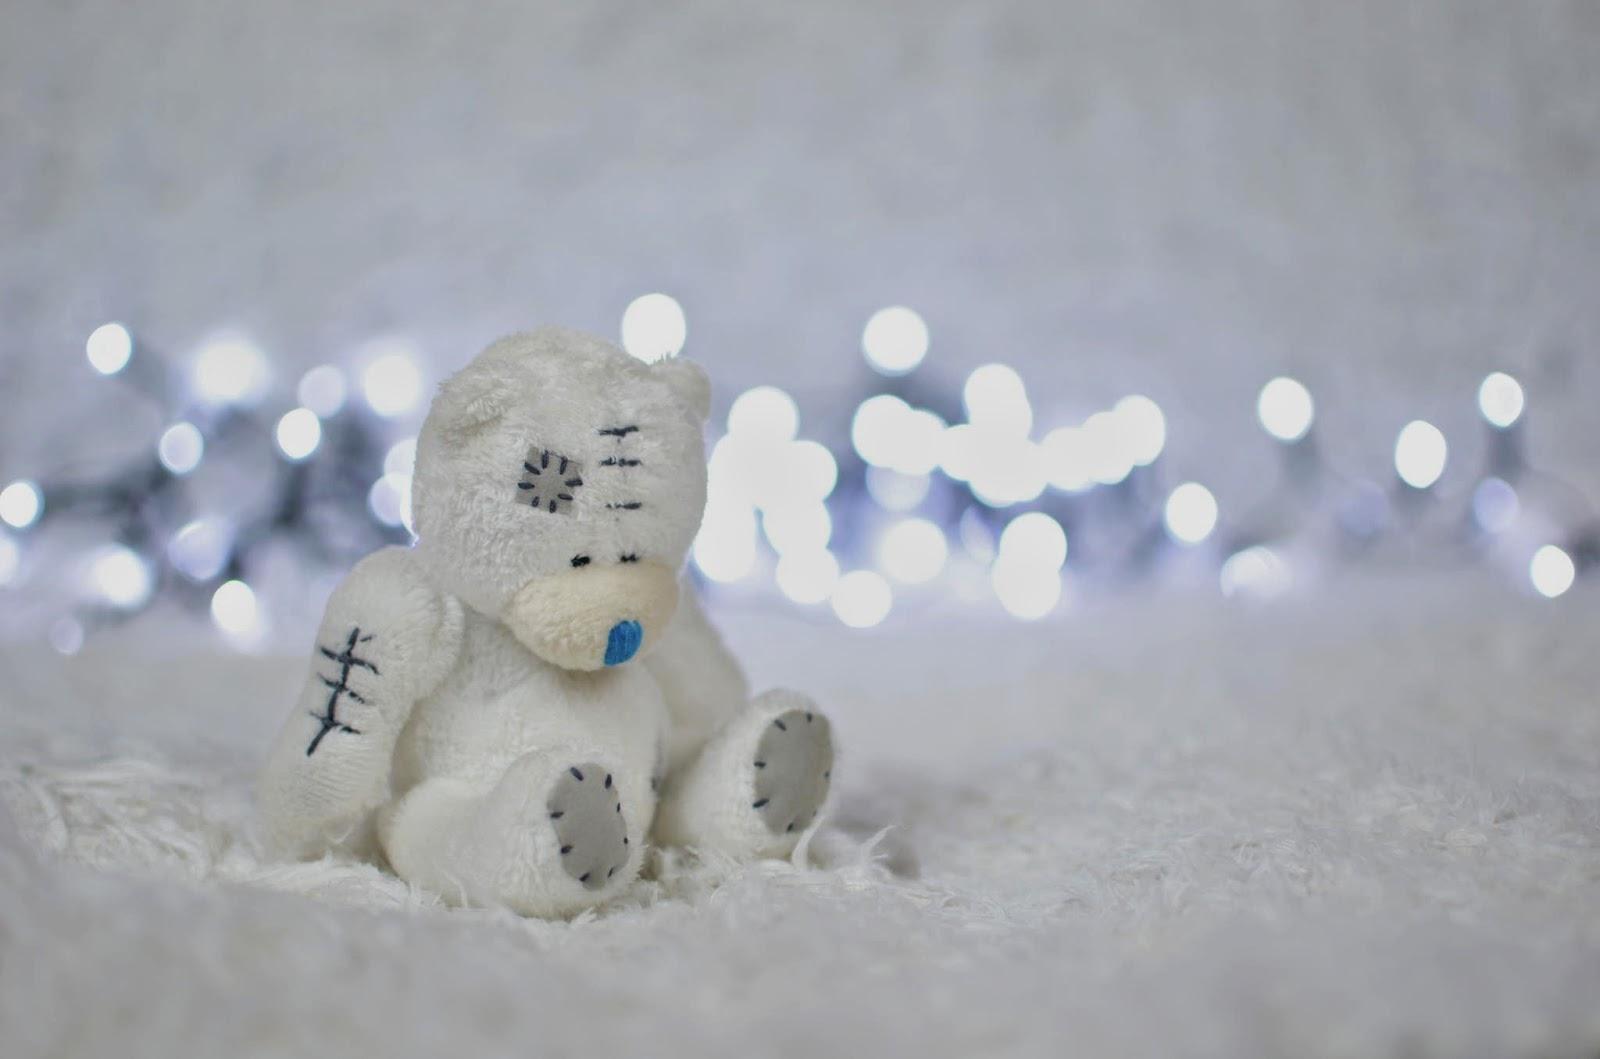 White-Teddy-Bear-sad-upset-image-resolution-2048x1356.jpg